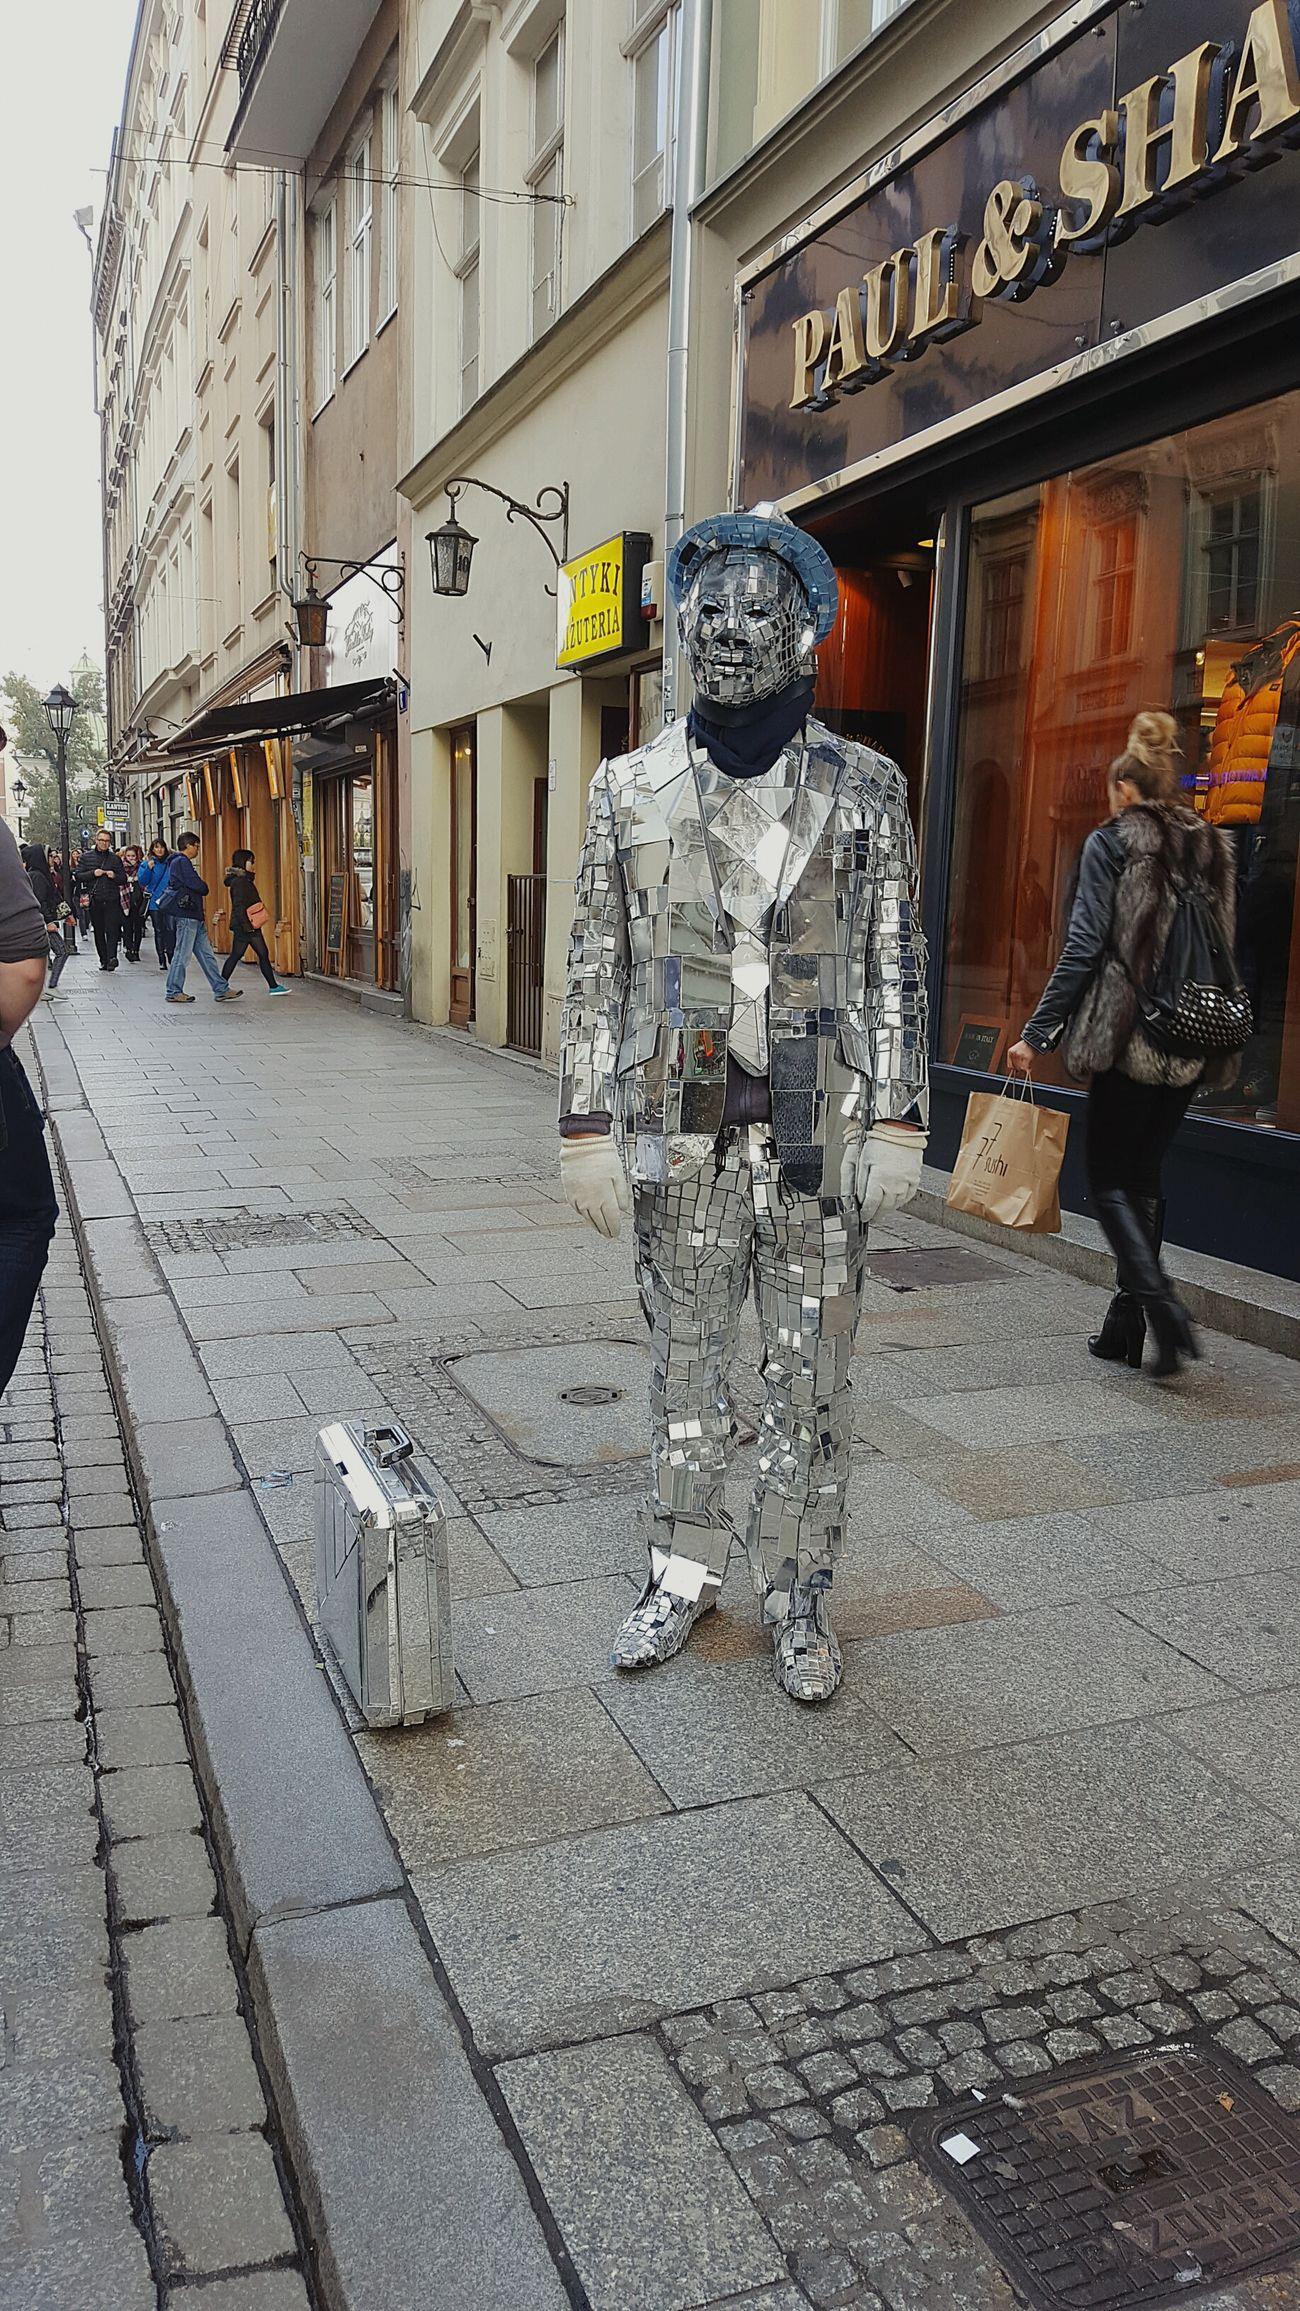 City Busker Busker Buskin' Tourist Attraction  Tourism Mirror Manofmirrors